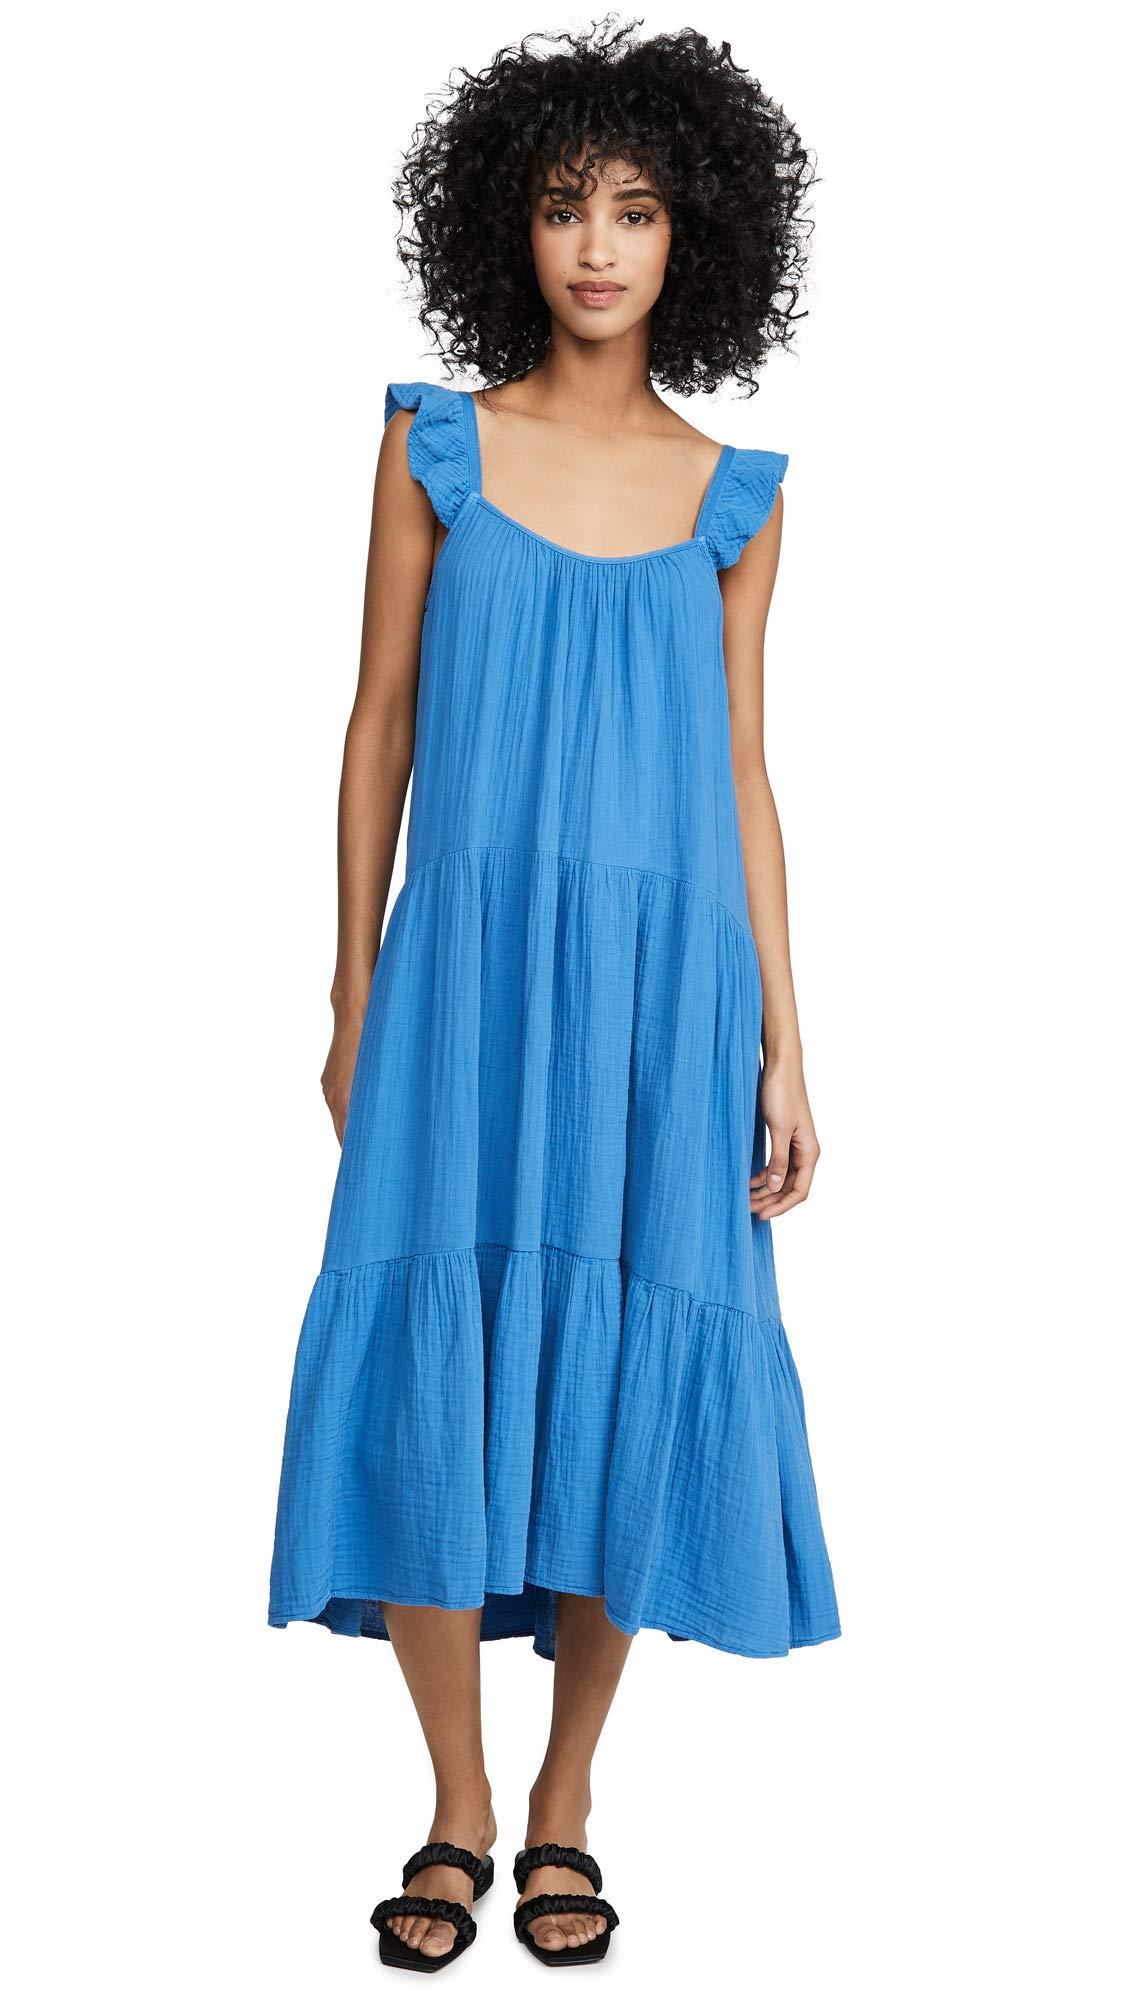 Available at Amazon: XIRENA Women's Rumer Dress